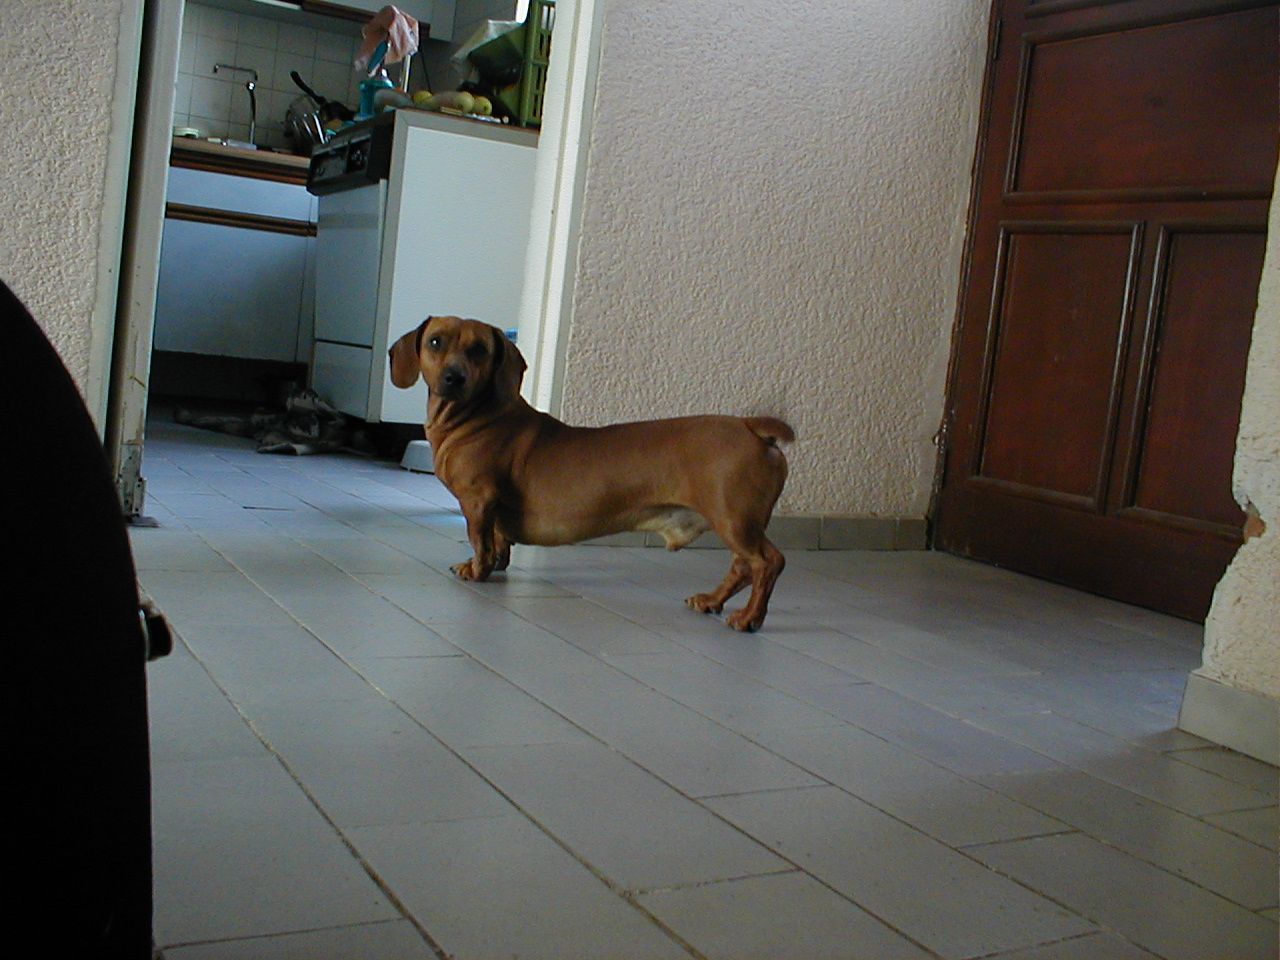 little dog spaniel brown fur coat house ears floor pet